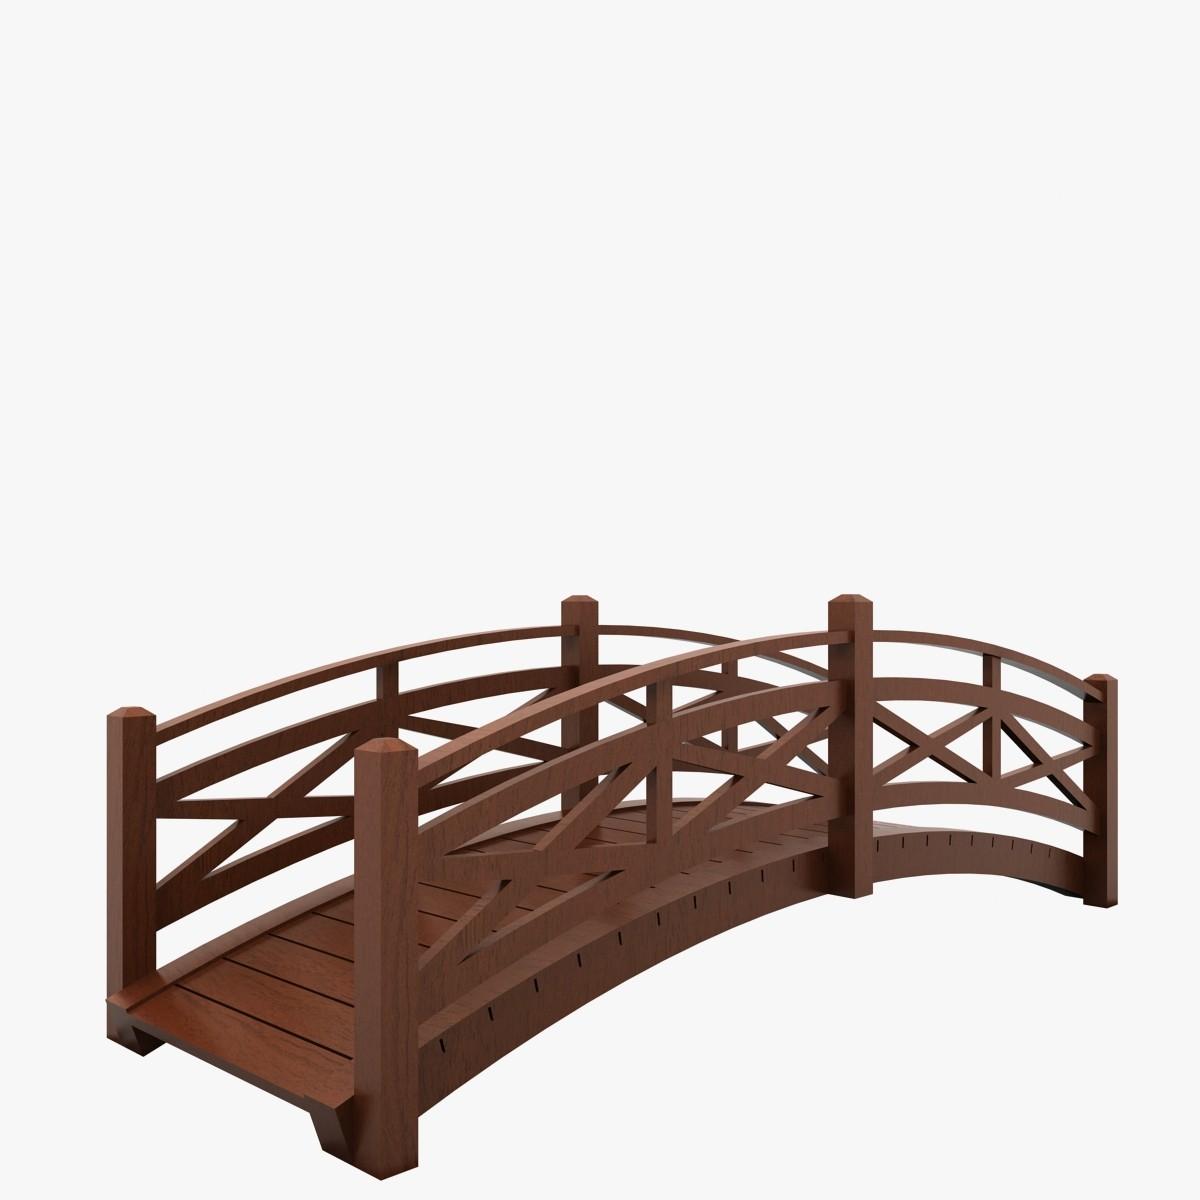 1200x1200 Wood Bridge Clipart